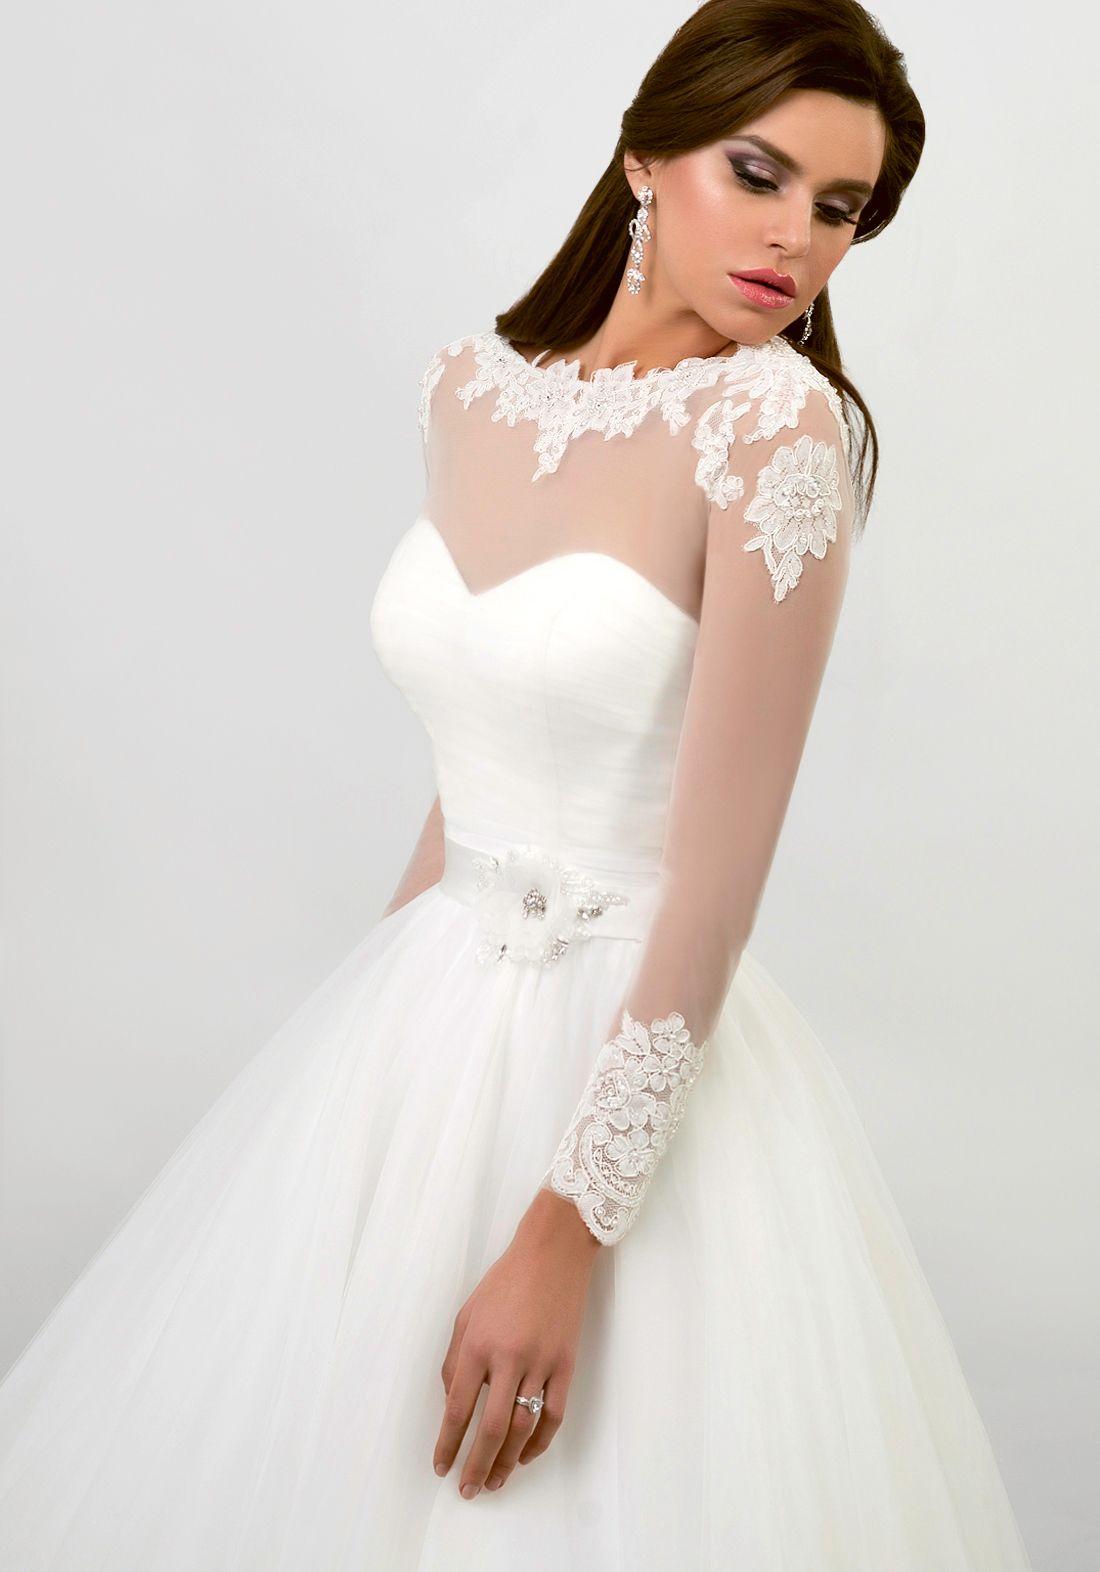 Sonya wedding dress love me forever by bien savvy winter